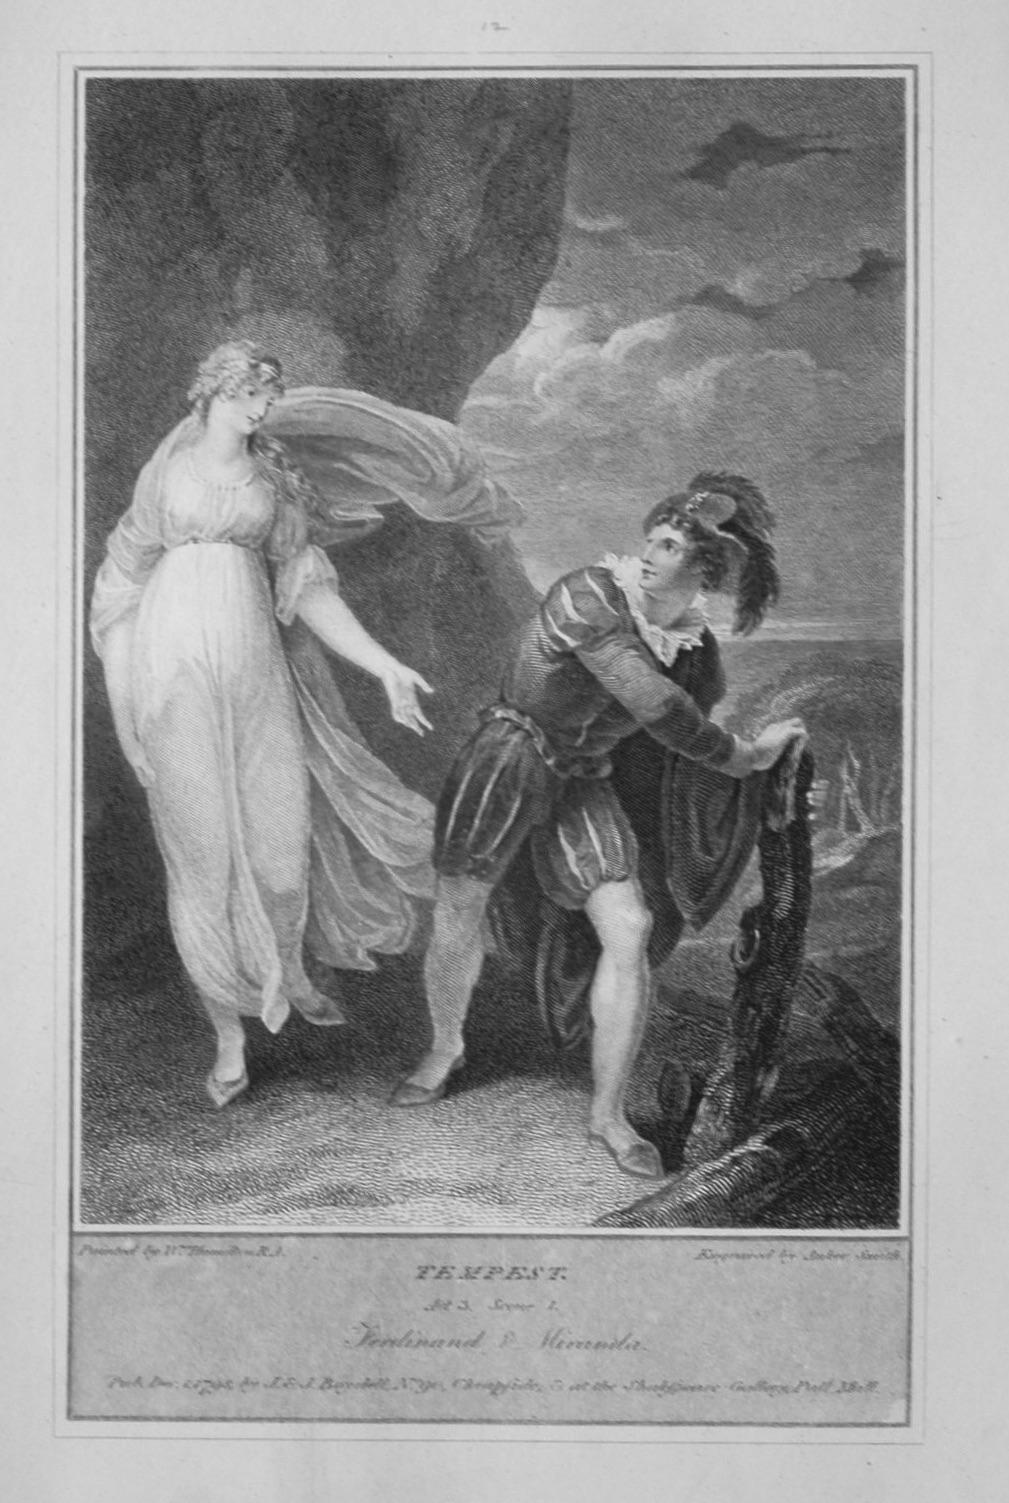 Tempest. Act 3, Scene 1. Ferdinand & Miranda.